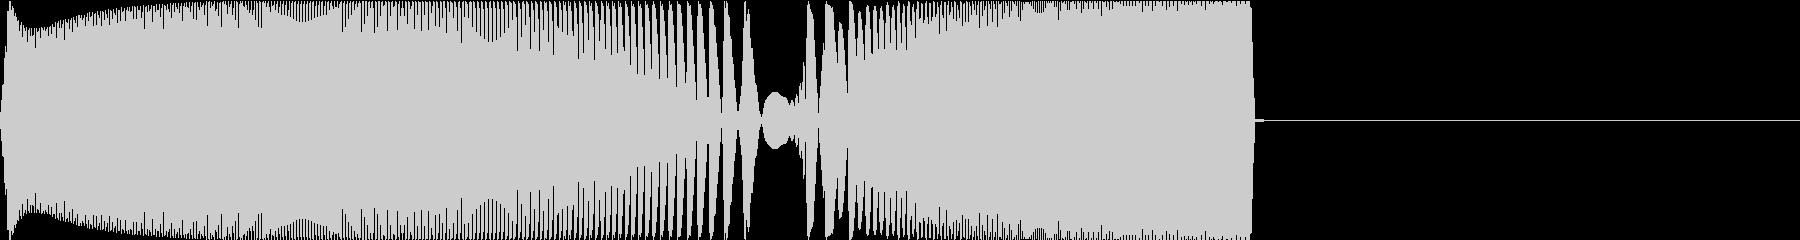 Game レトロなゲームコマンド音 1の未再生の波形